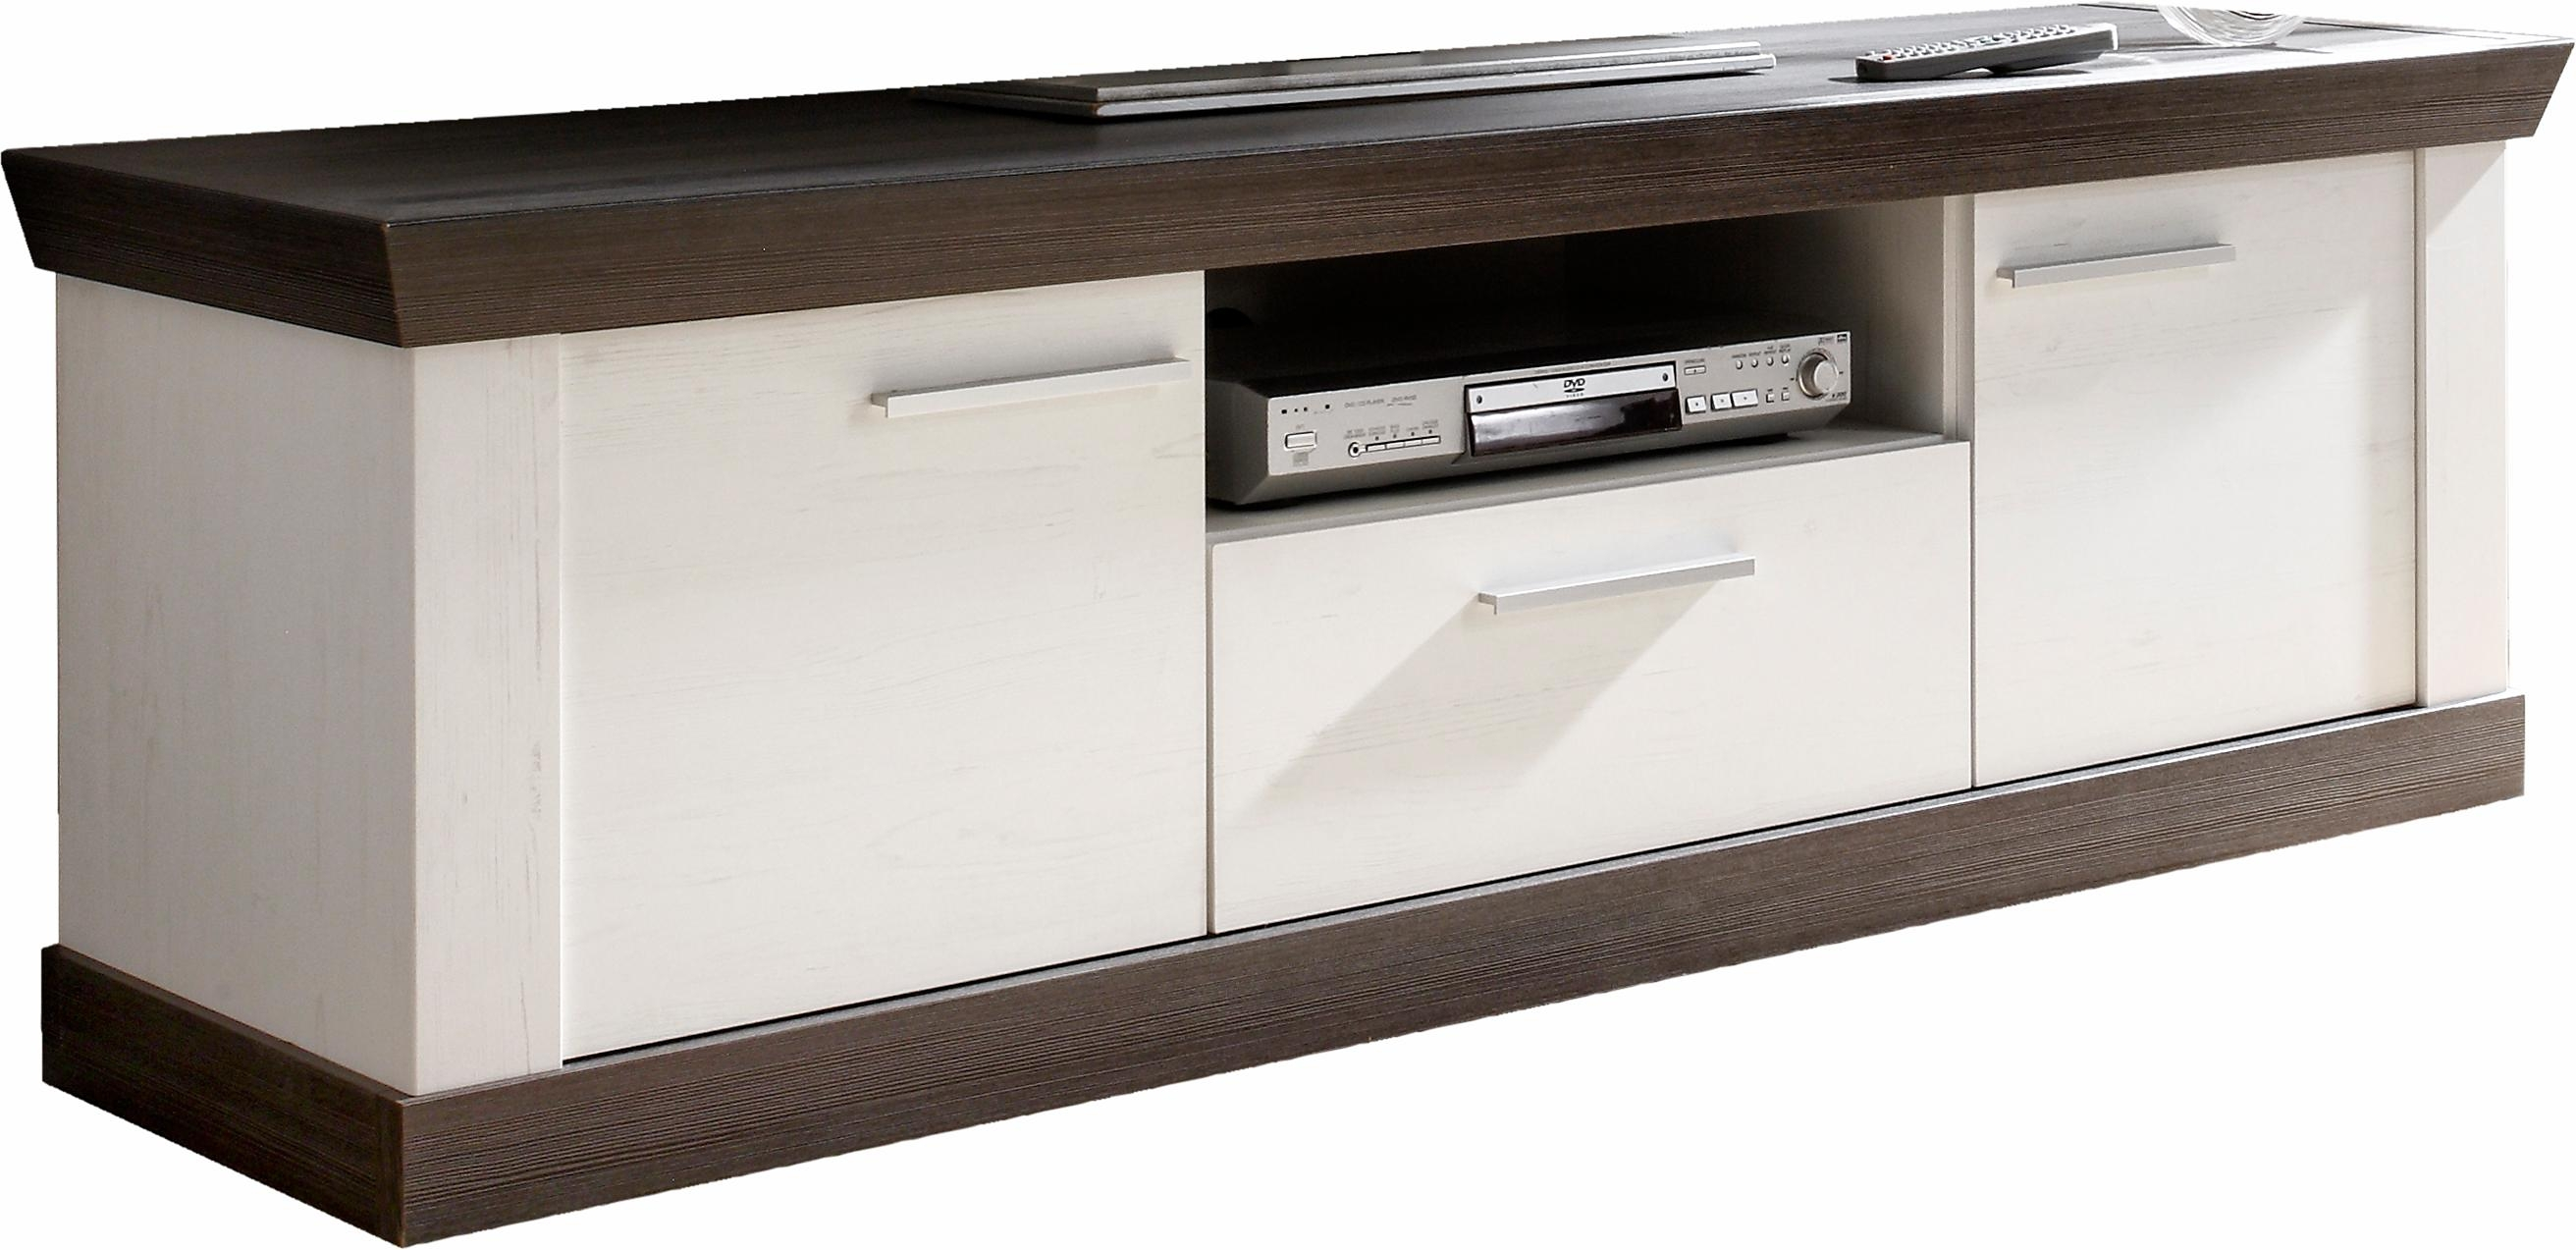 Home affaire lowboard »Siena«, breedte 158 cm online kopen op otto.nl